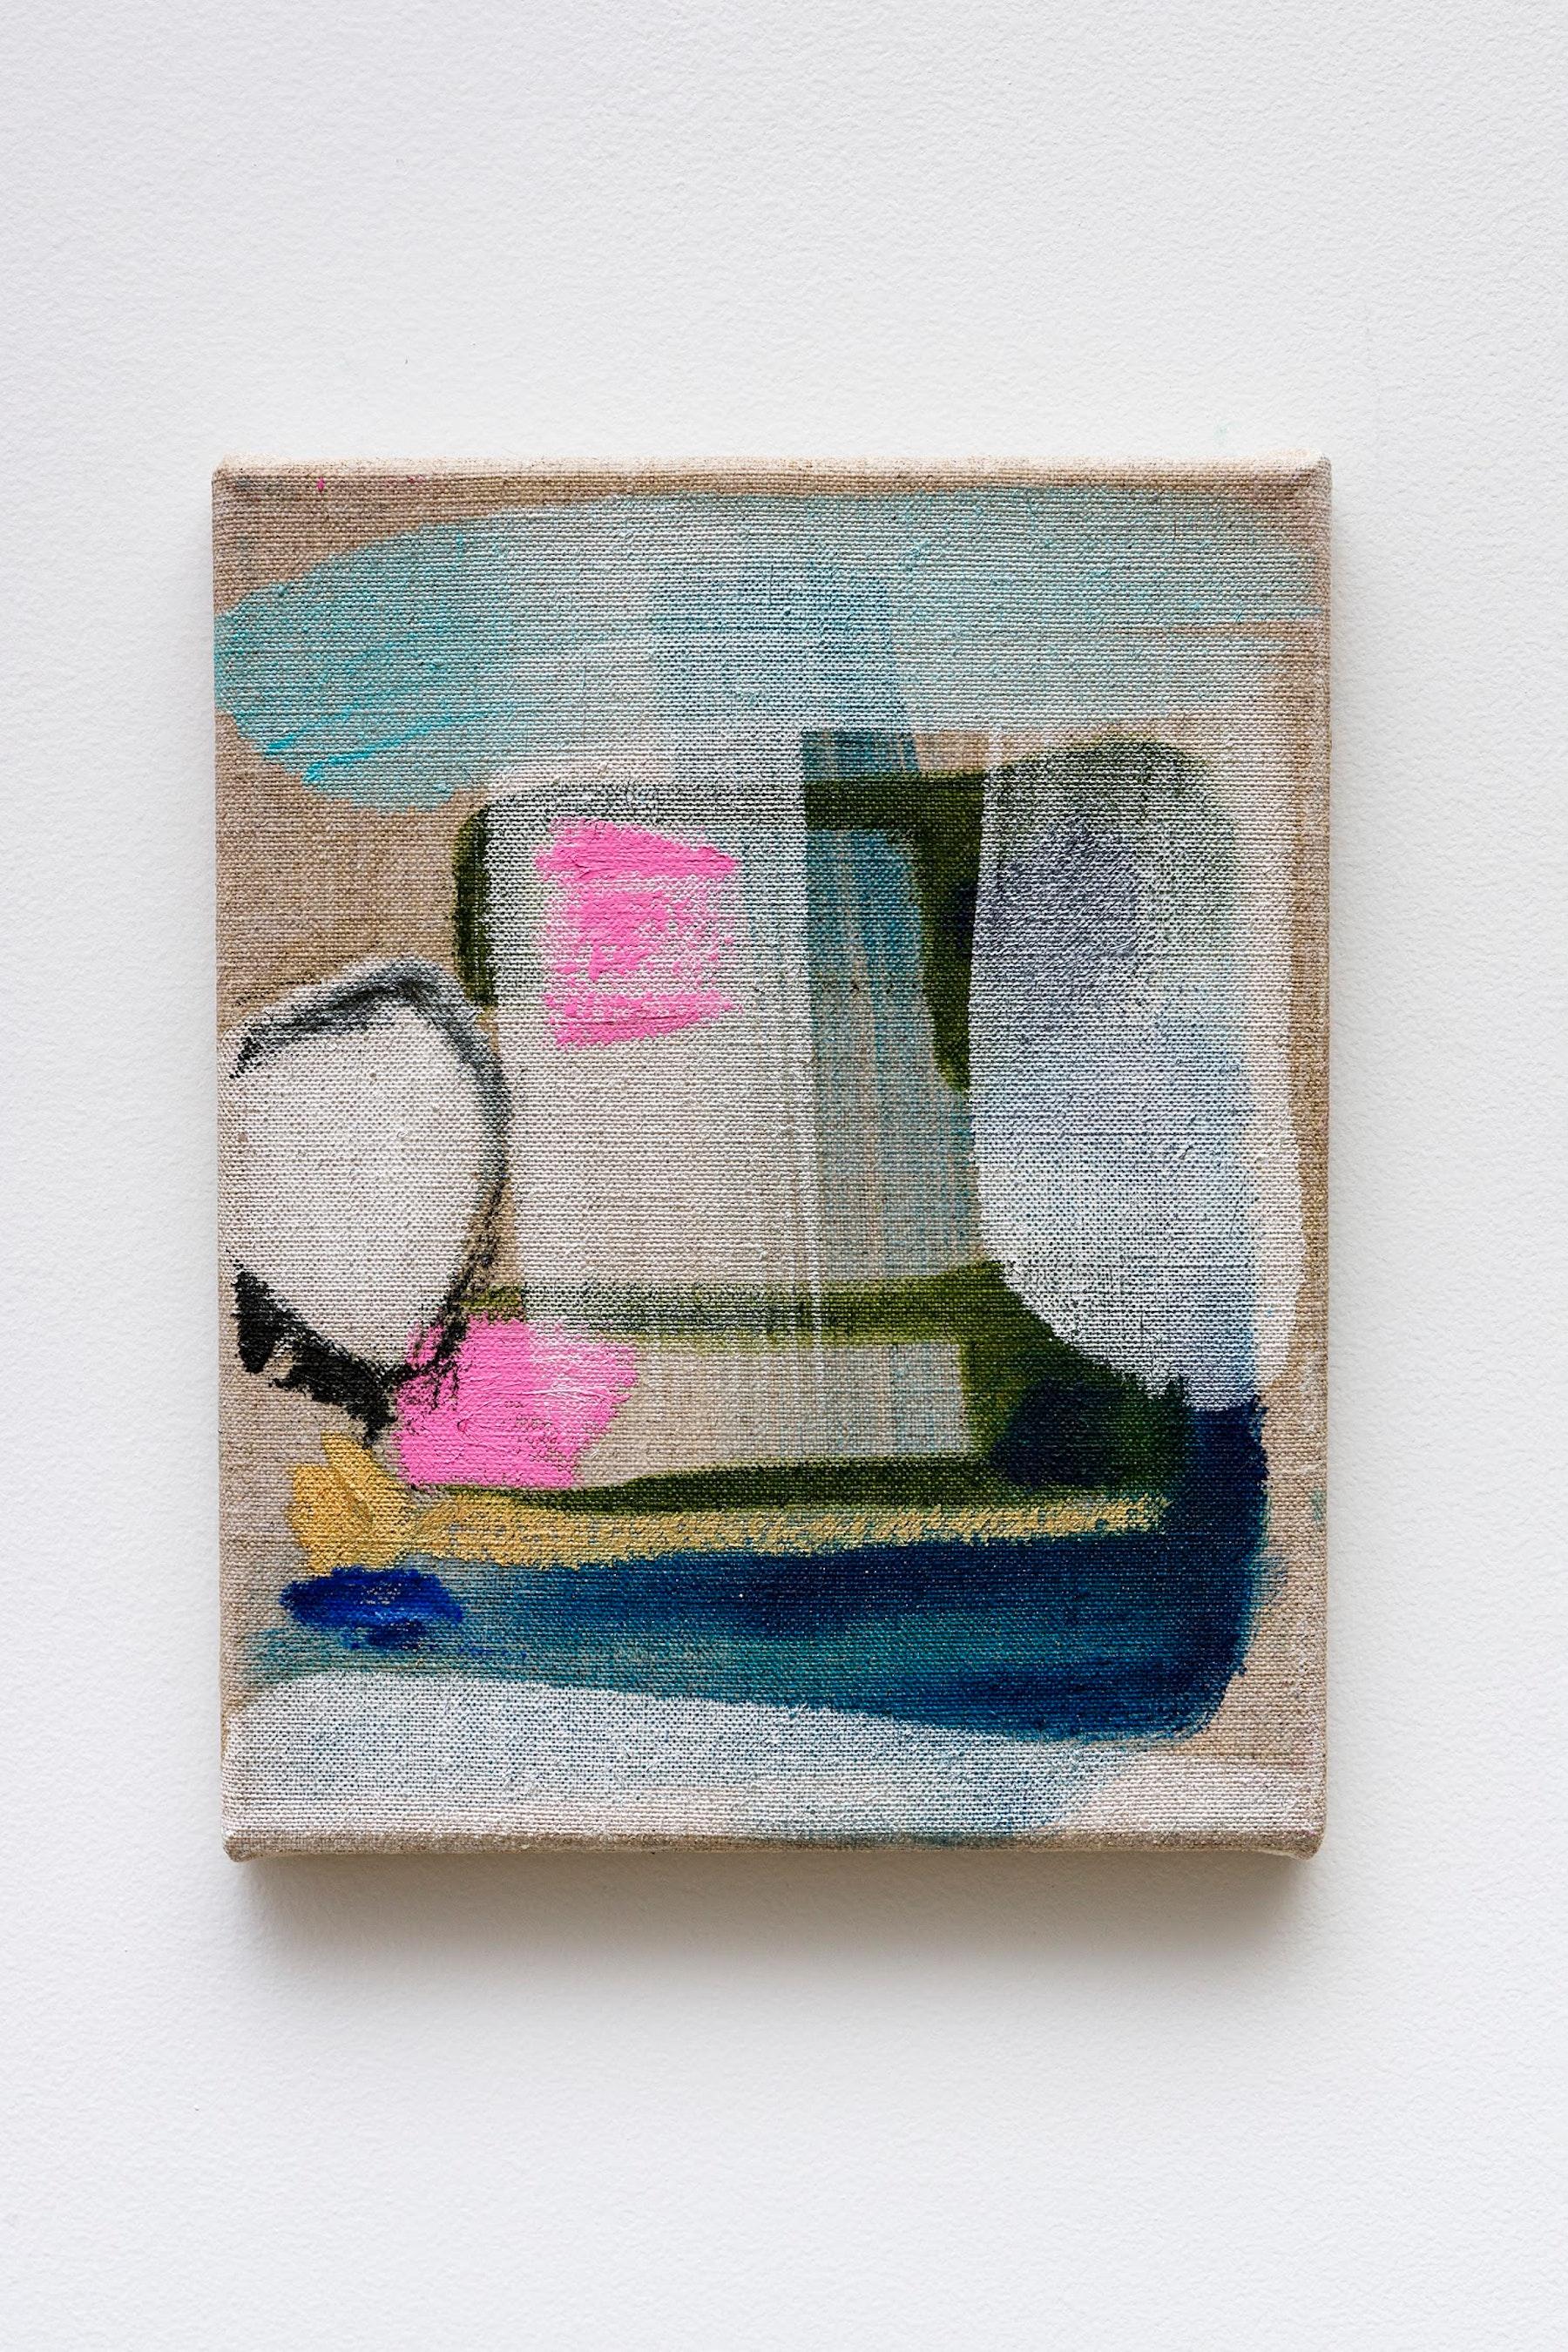 "Monique Van Genderen ""Untitled,"" 2020 Oil on linen 10 x 8"" [HxW] (25.4 x 20.32 cm) Inventory #VGE403 Courtesy of the artist and Vielmetter Los Angeles Photo credit: Jeff Mclane"